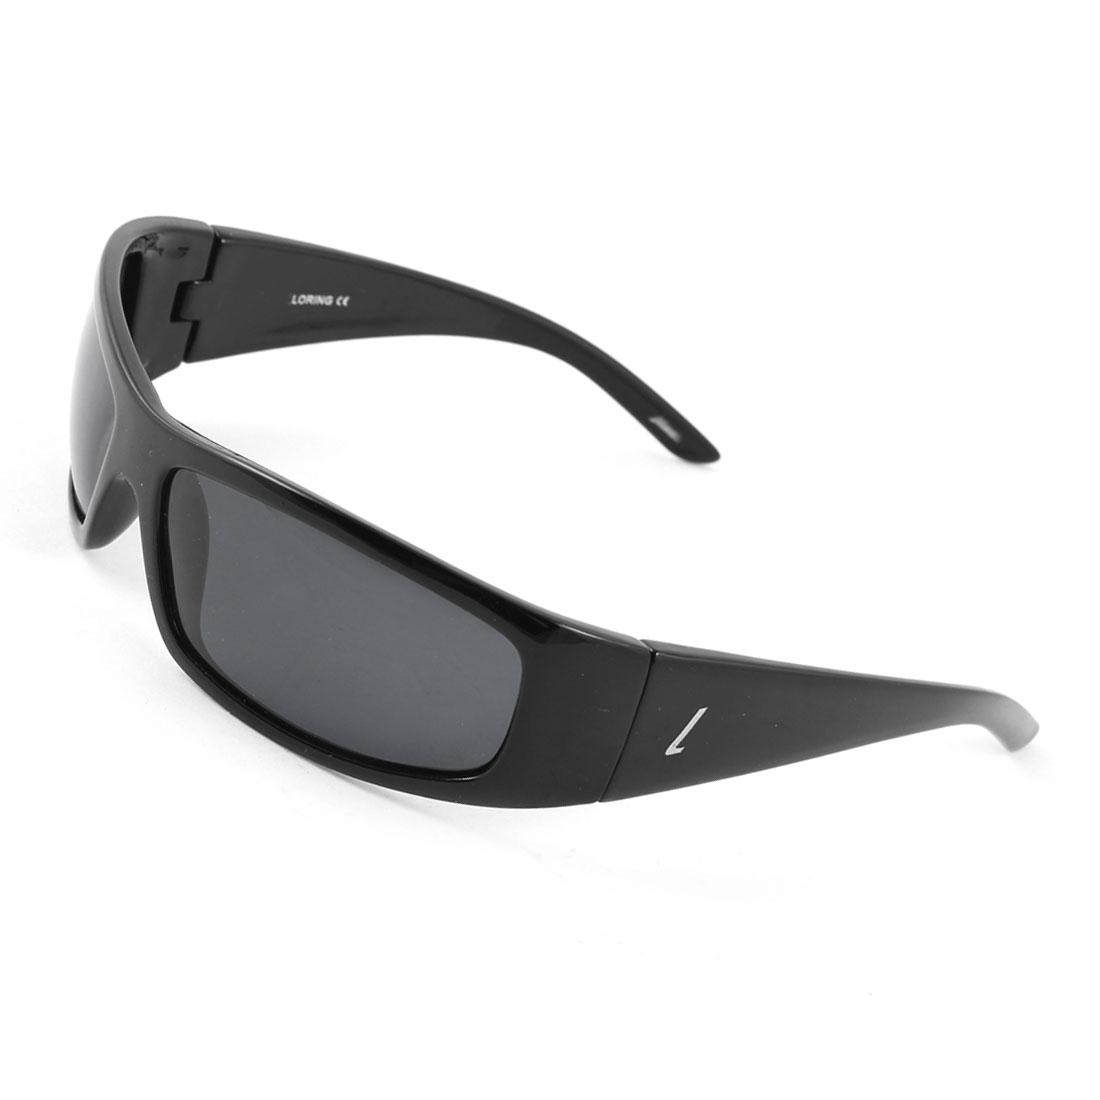 Fashionable Wide Temple Plastic Full Rim Rectangle Frame Gray Lens Leisure Polarized Sun Glasses Black for Man